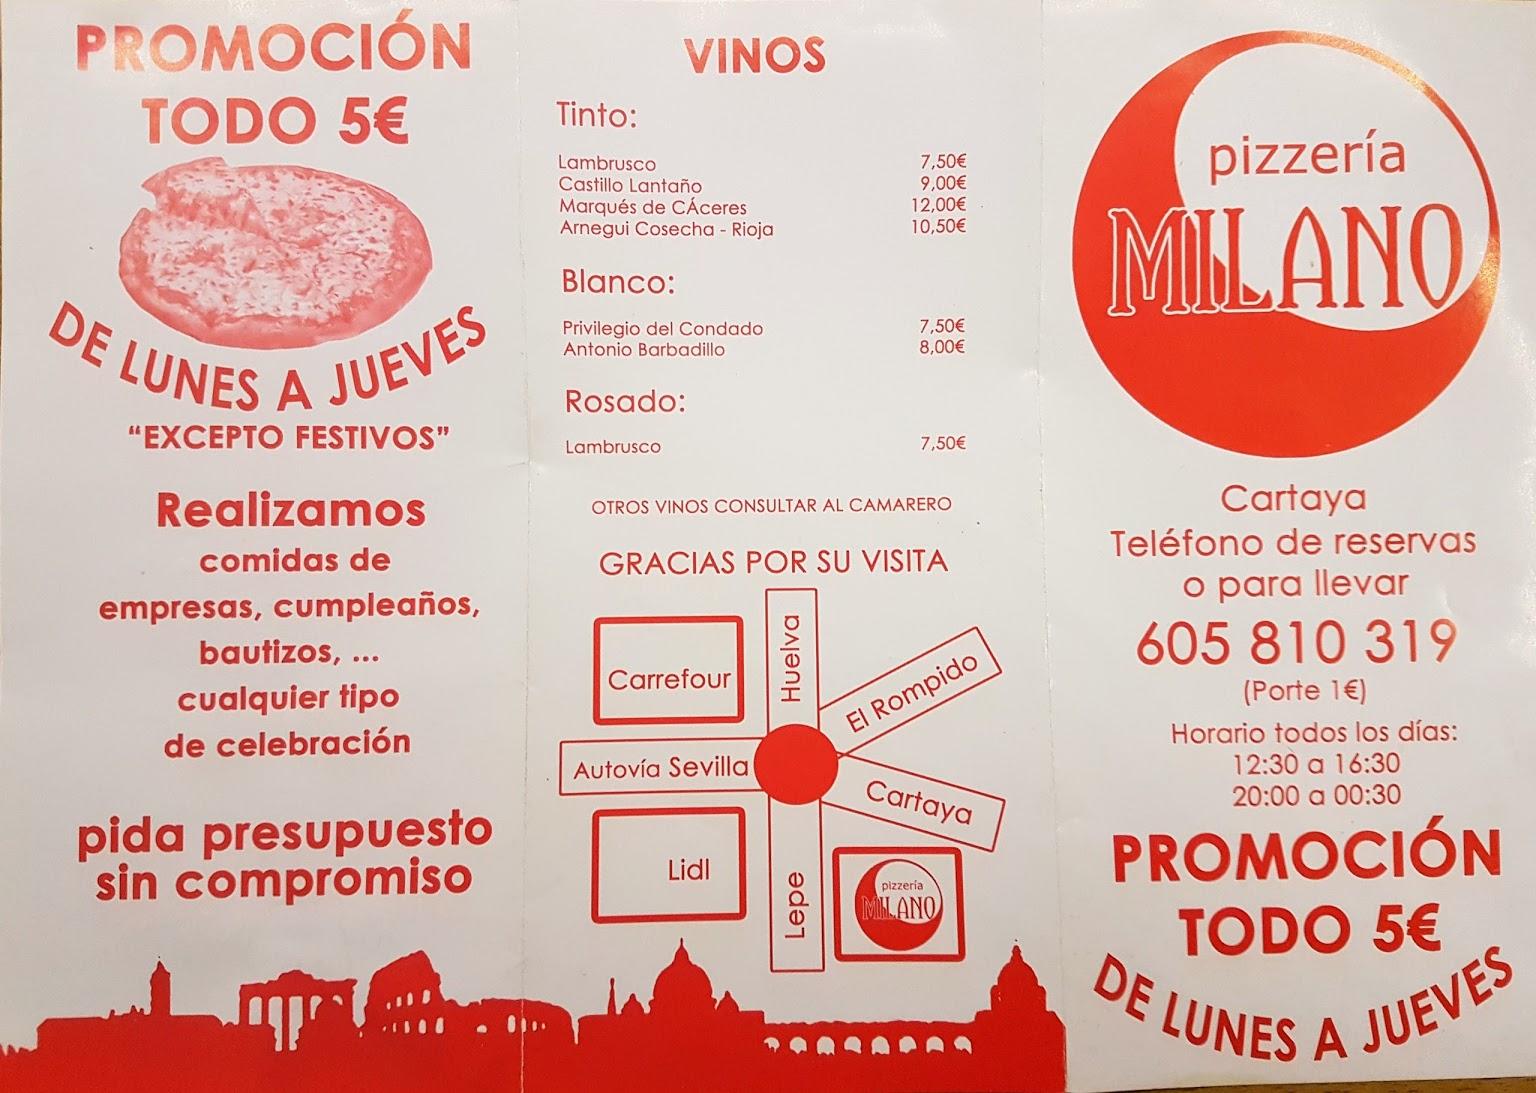 Pizzeria Milano Carta